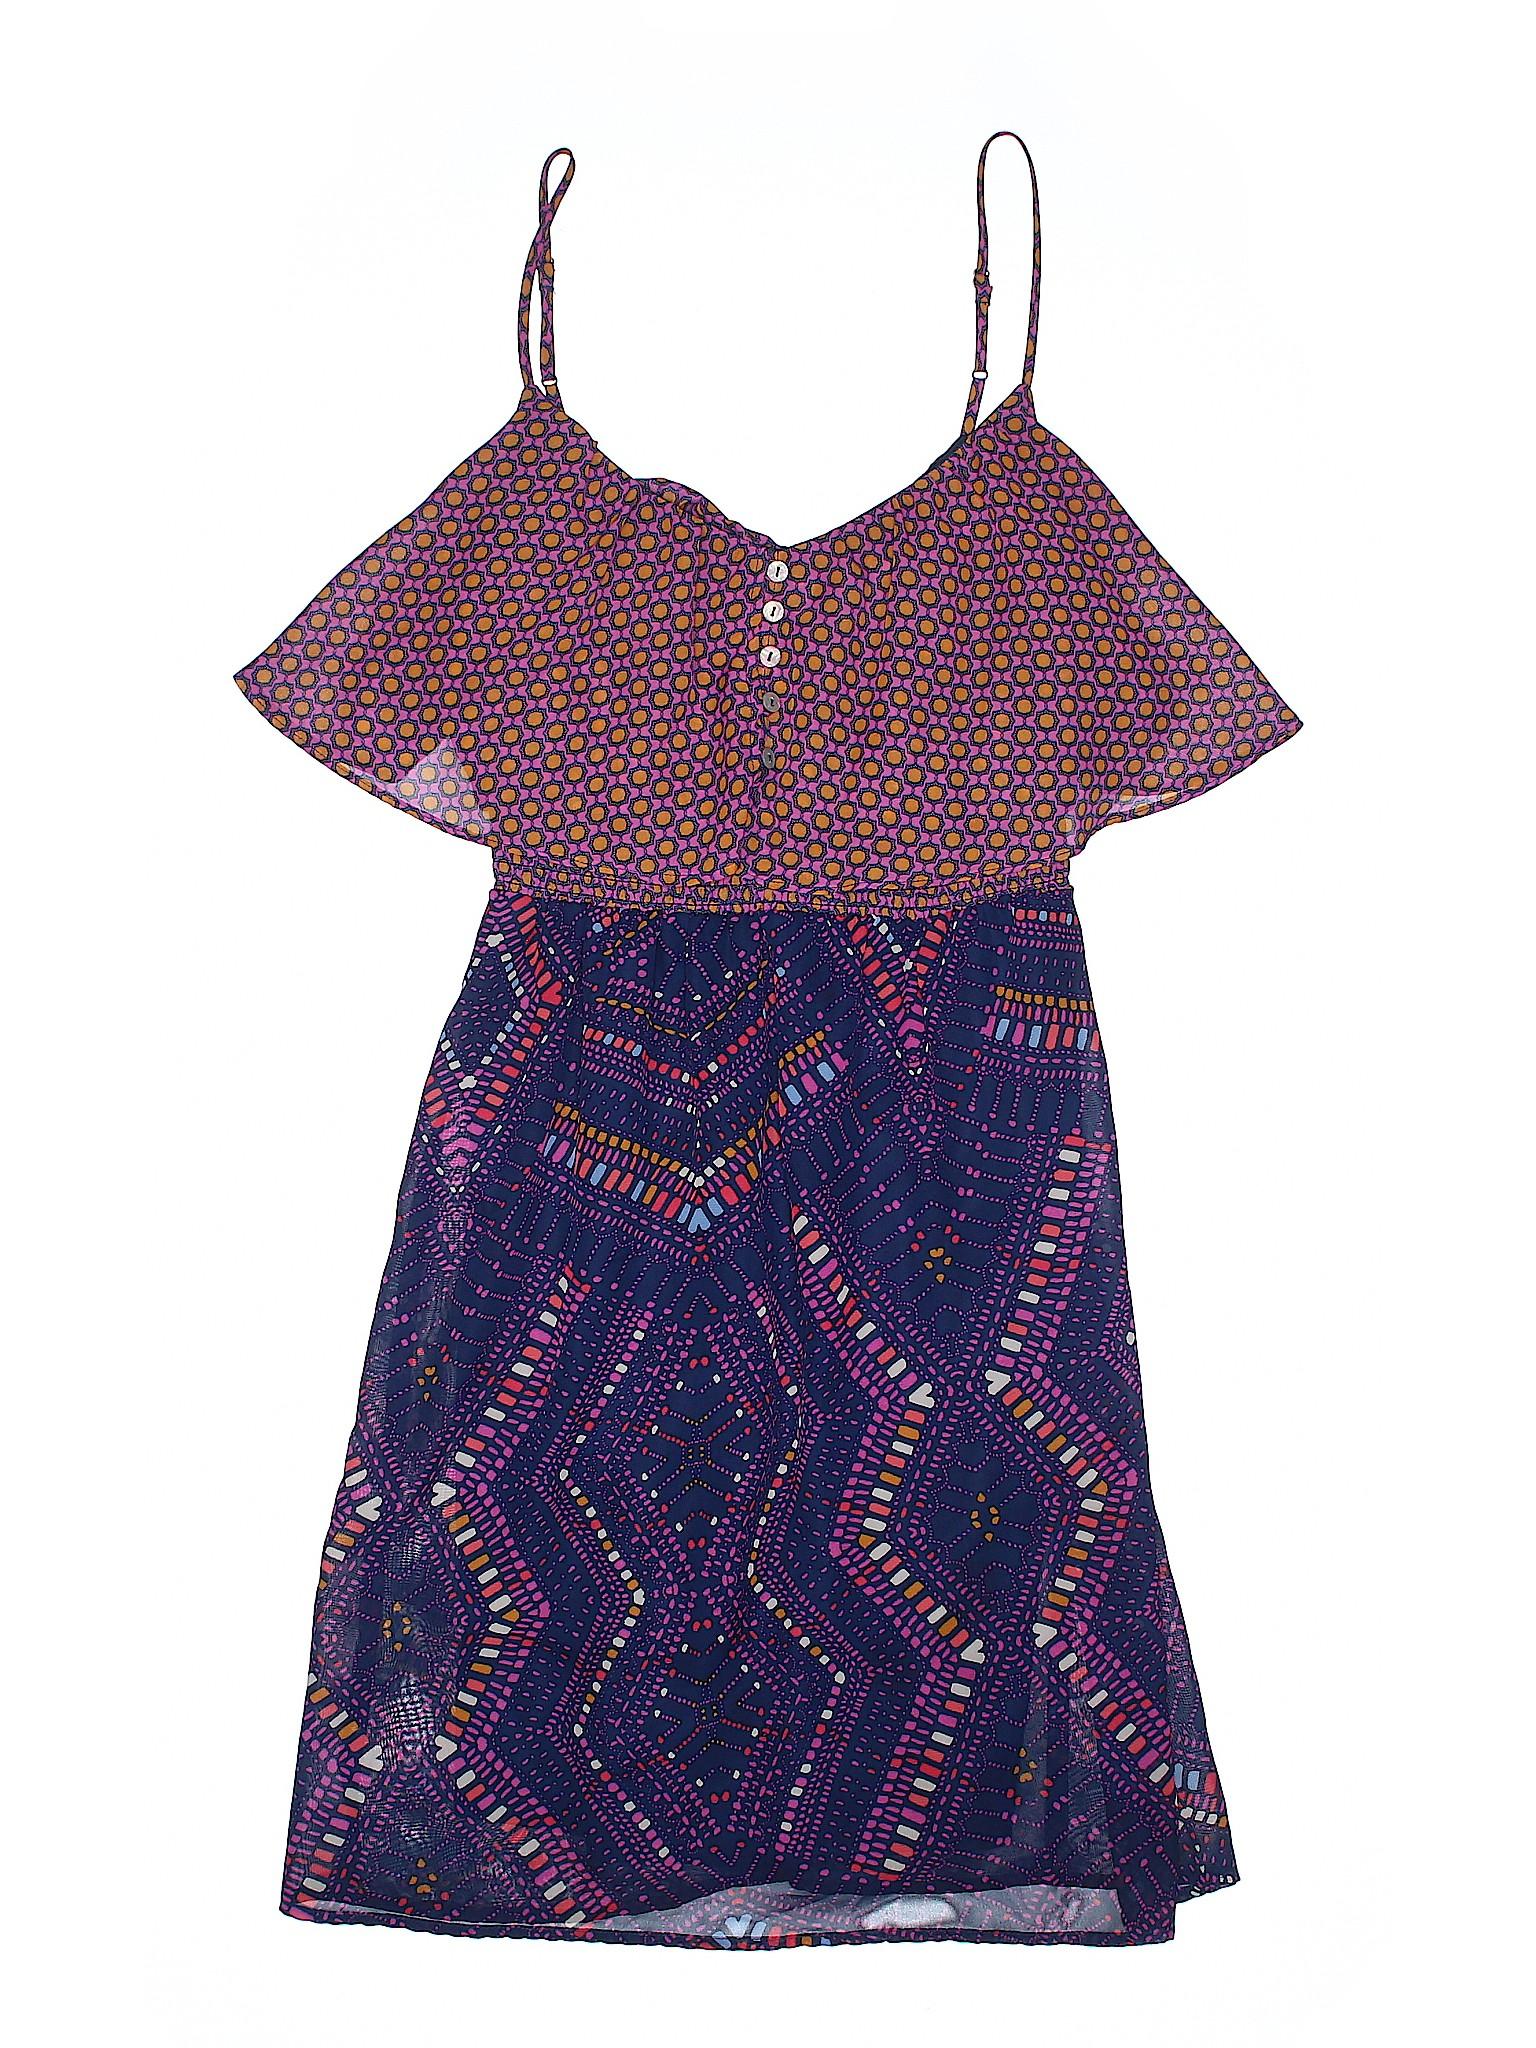 winter Casual Boutique Dress Xhilaration winter Boutique x7HES